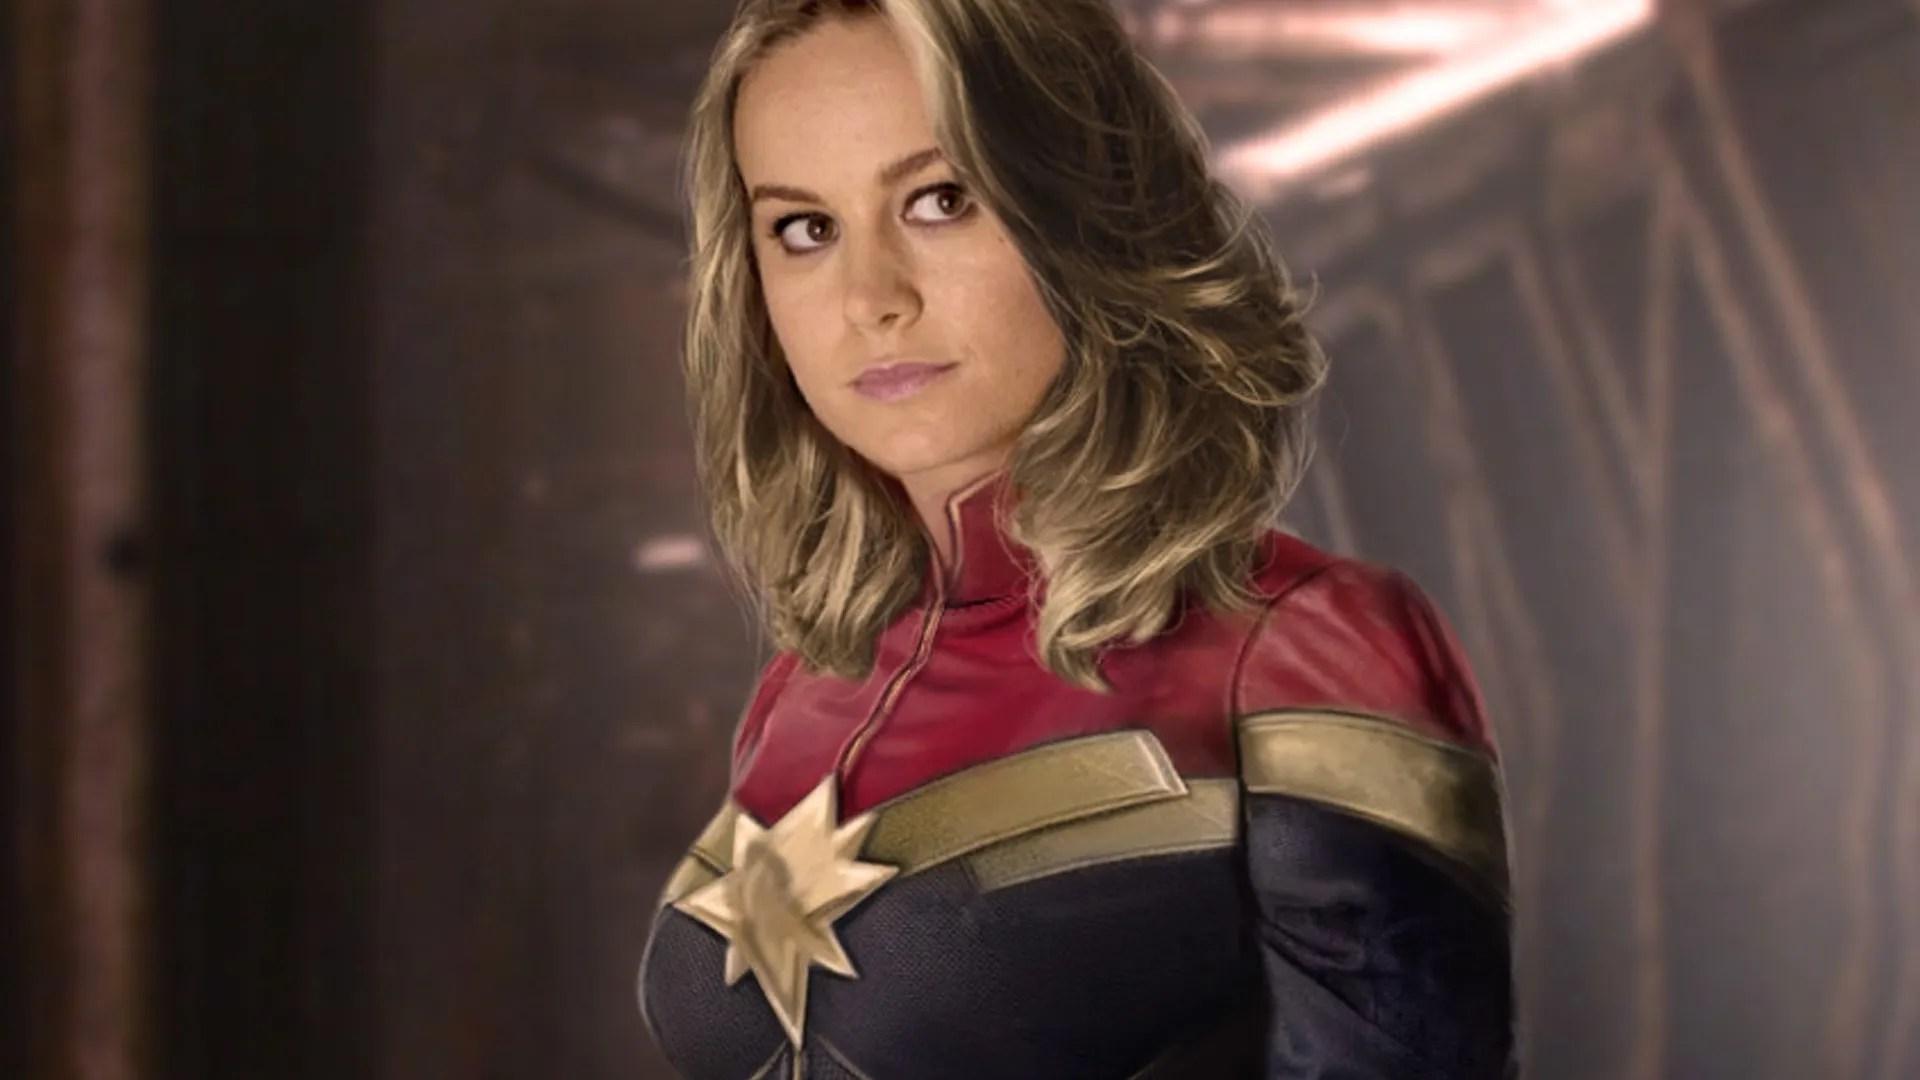 captain marvel' arrives, smashing superhero stereotypes